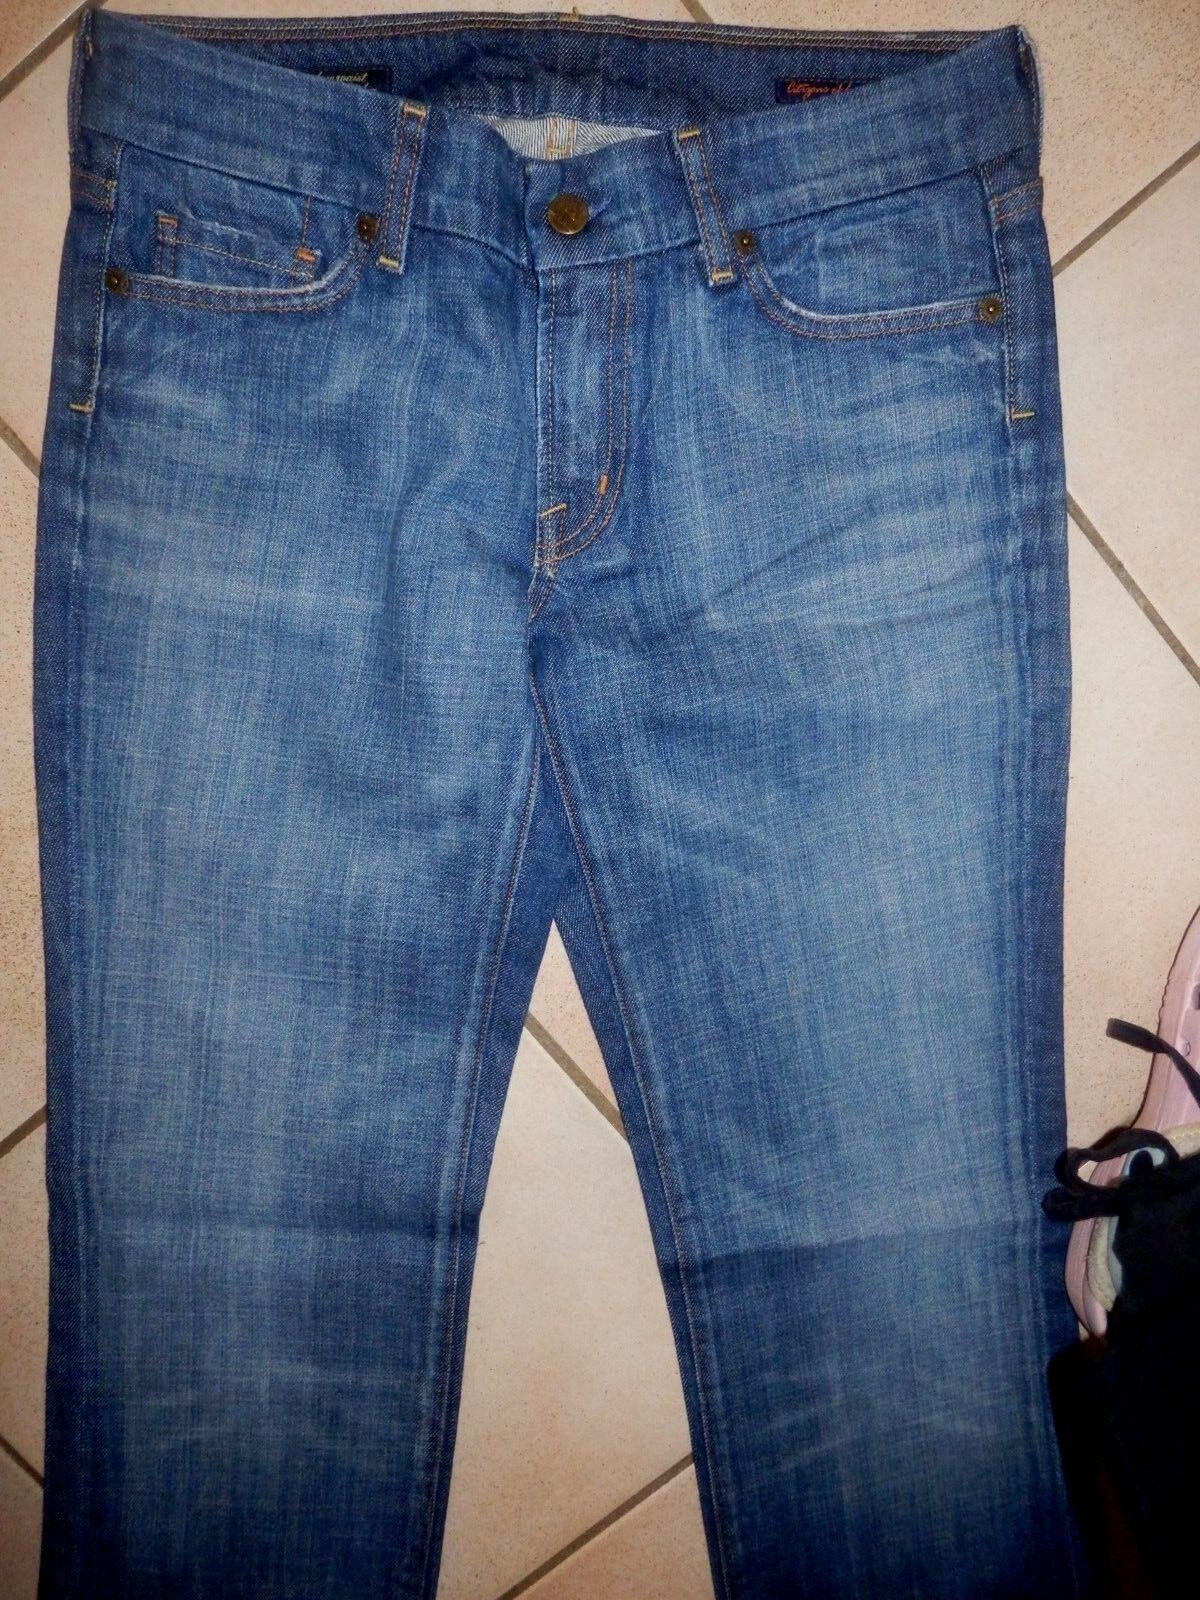 Details zu Colac Martha 4290272 Damenjeans 36 52 Lg. 30,32,34 blue black Jeans